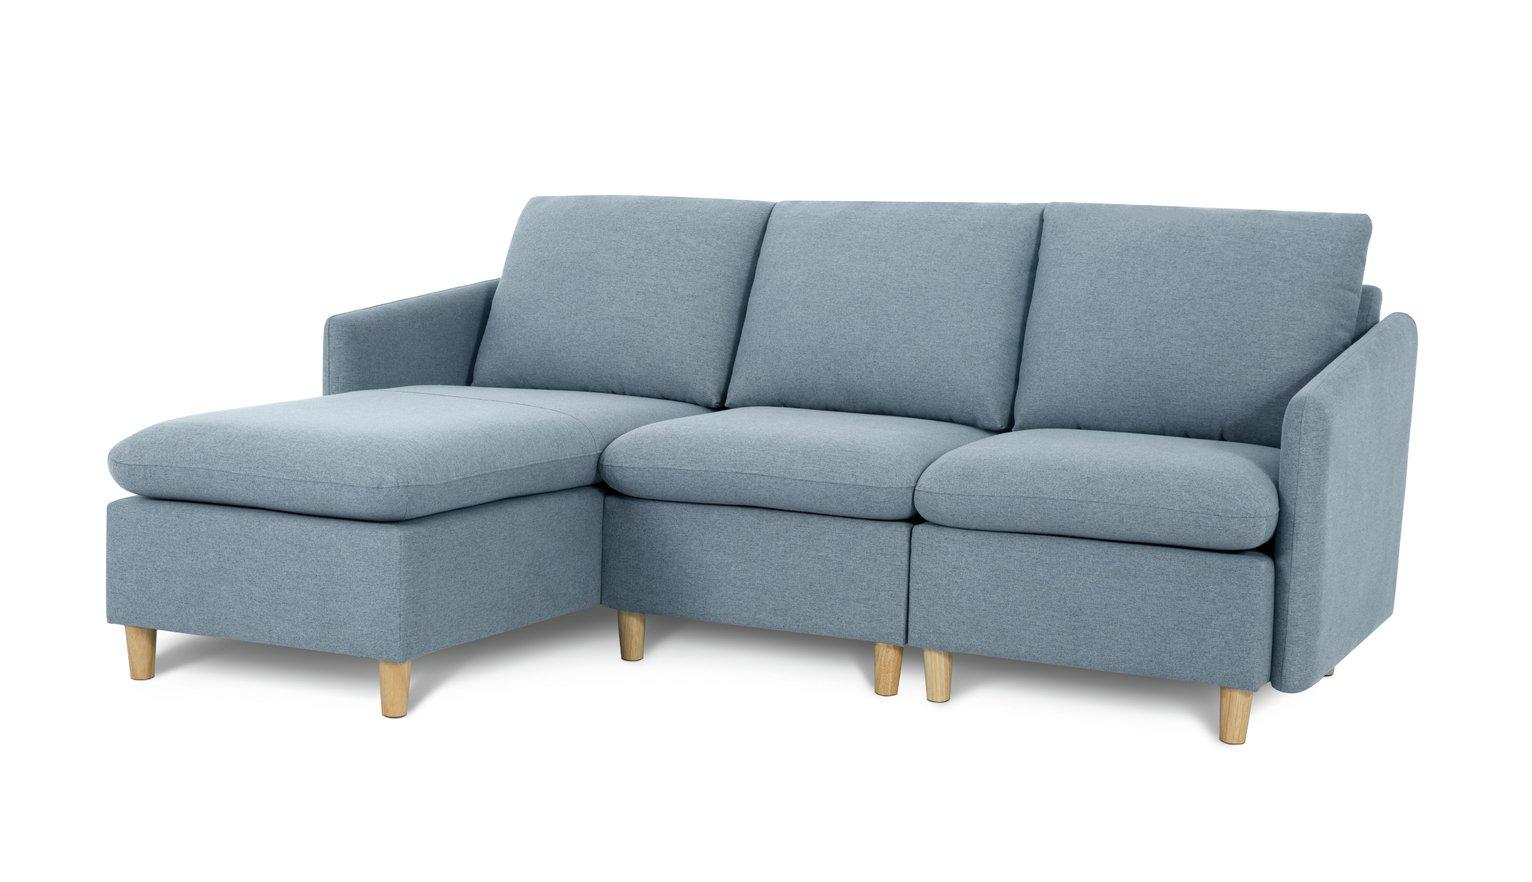 Habitat Mod Reversible Corner Fabric Sofa - Blue